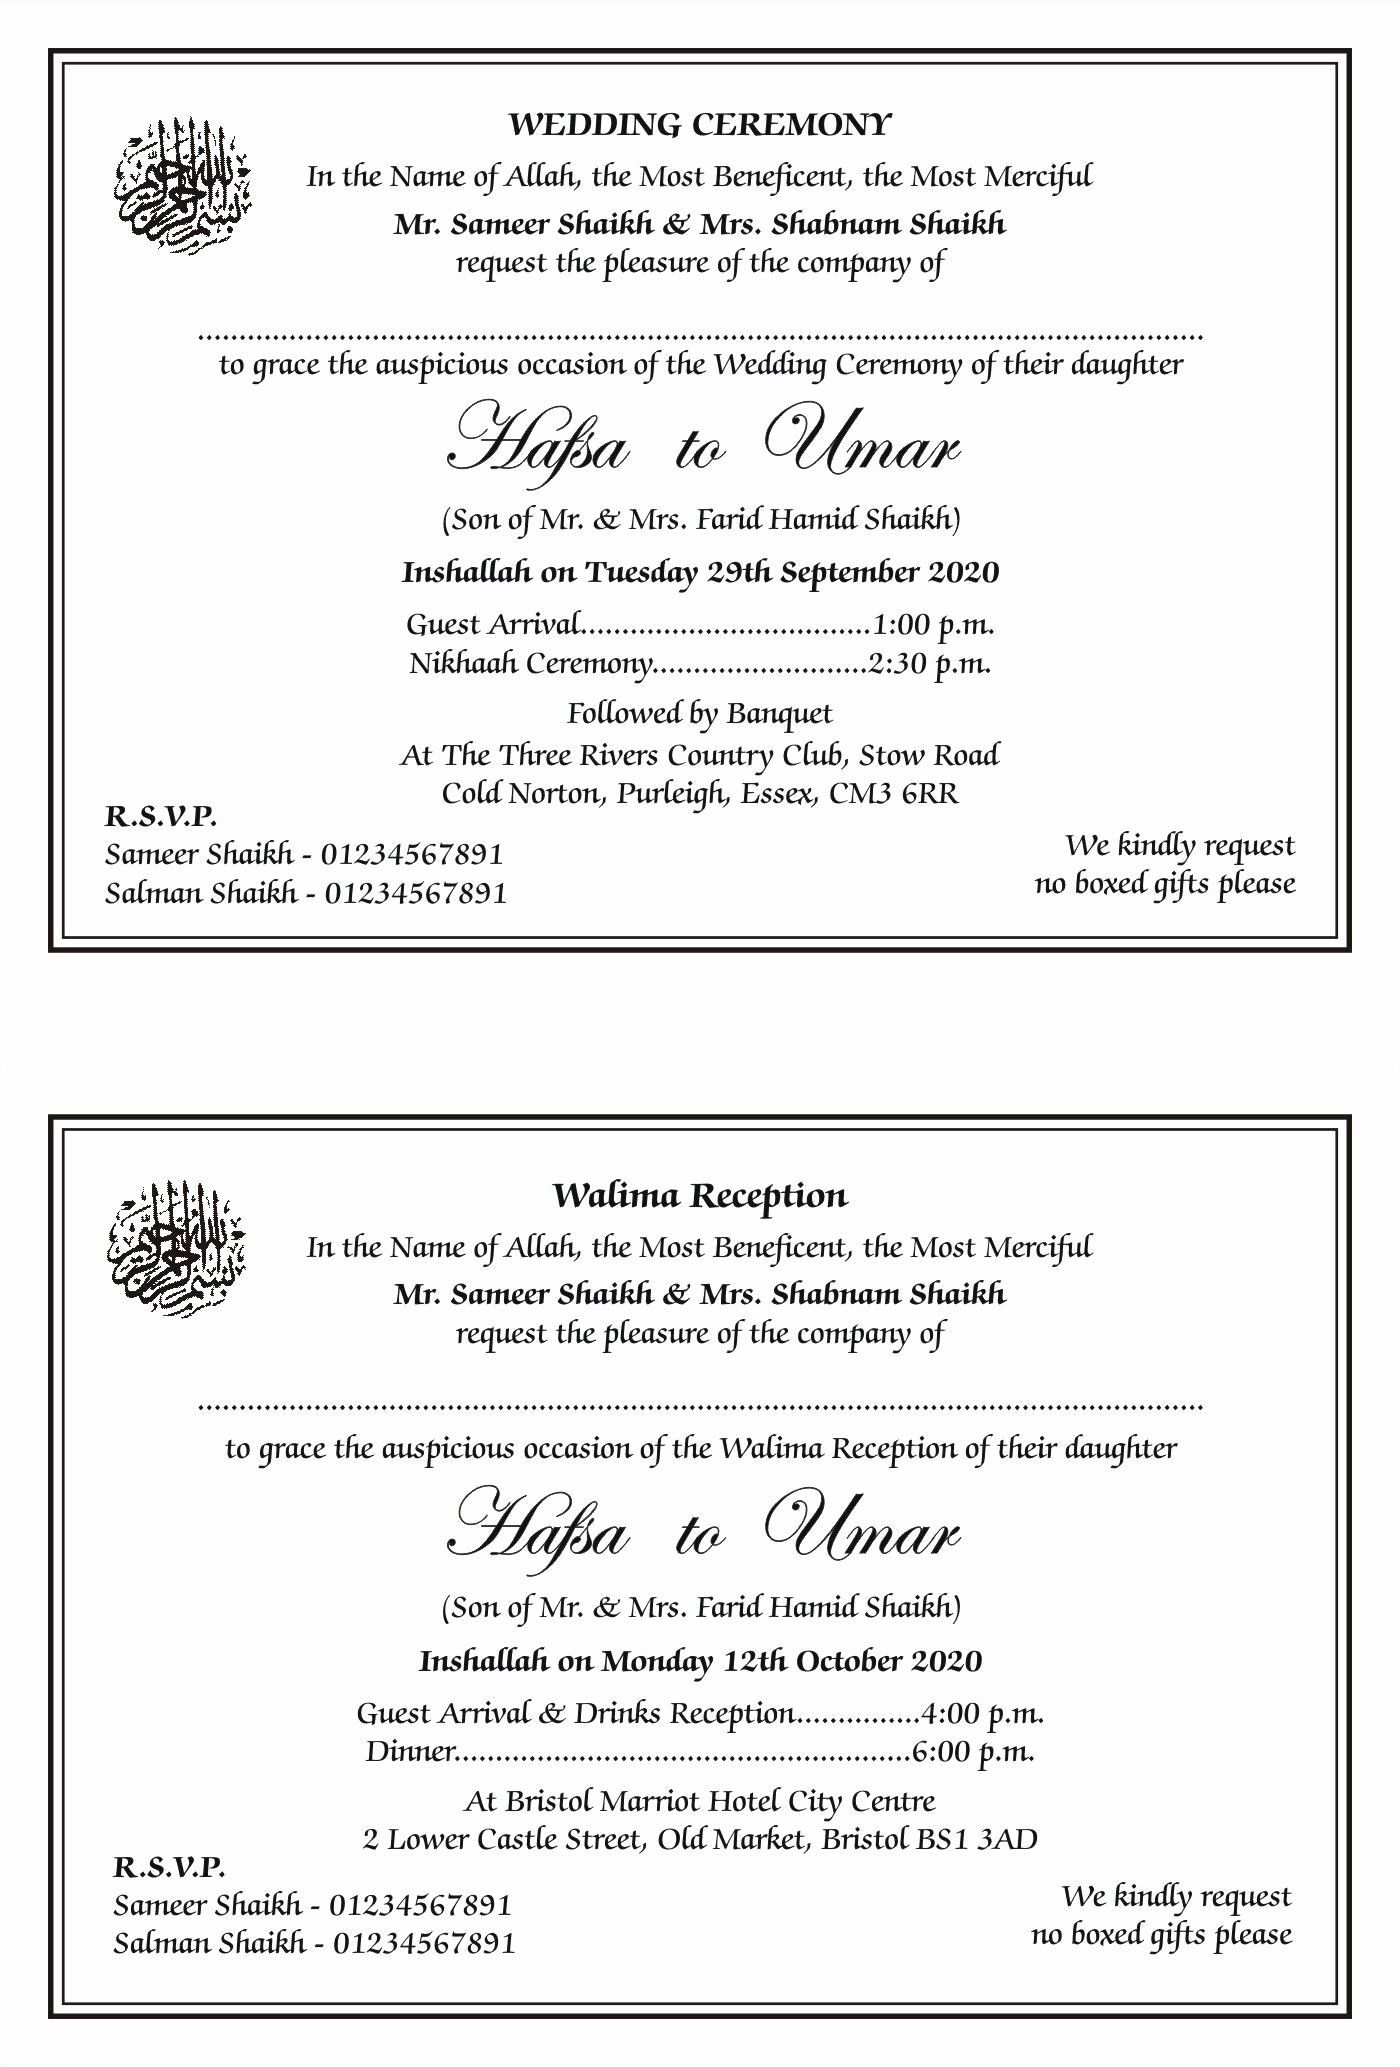 Walima Invitation Cards Wordings Elegant Walima Invitation Cards Wordings Fresh Shaad Muslim Wedding Invitations Marriage Cards Wedding Invitation Card Wording